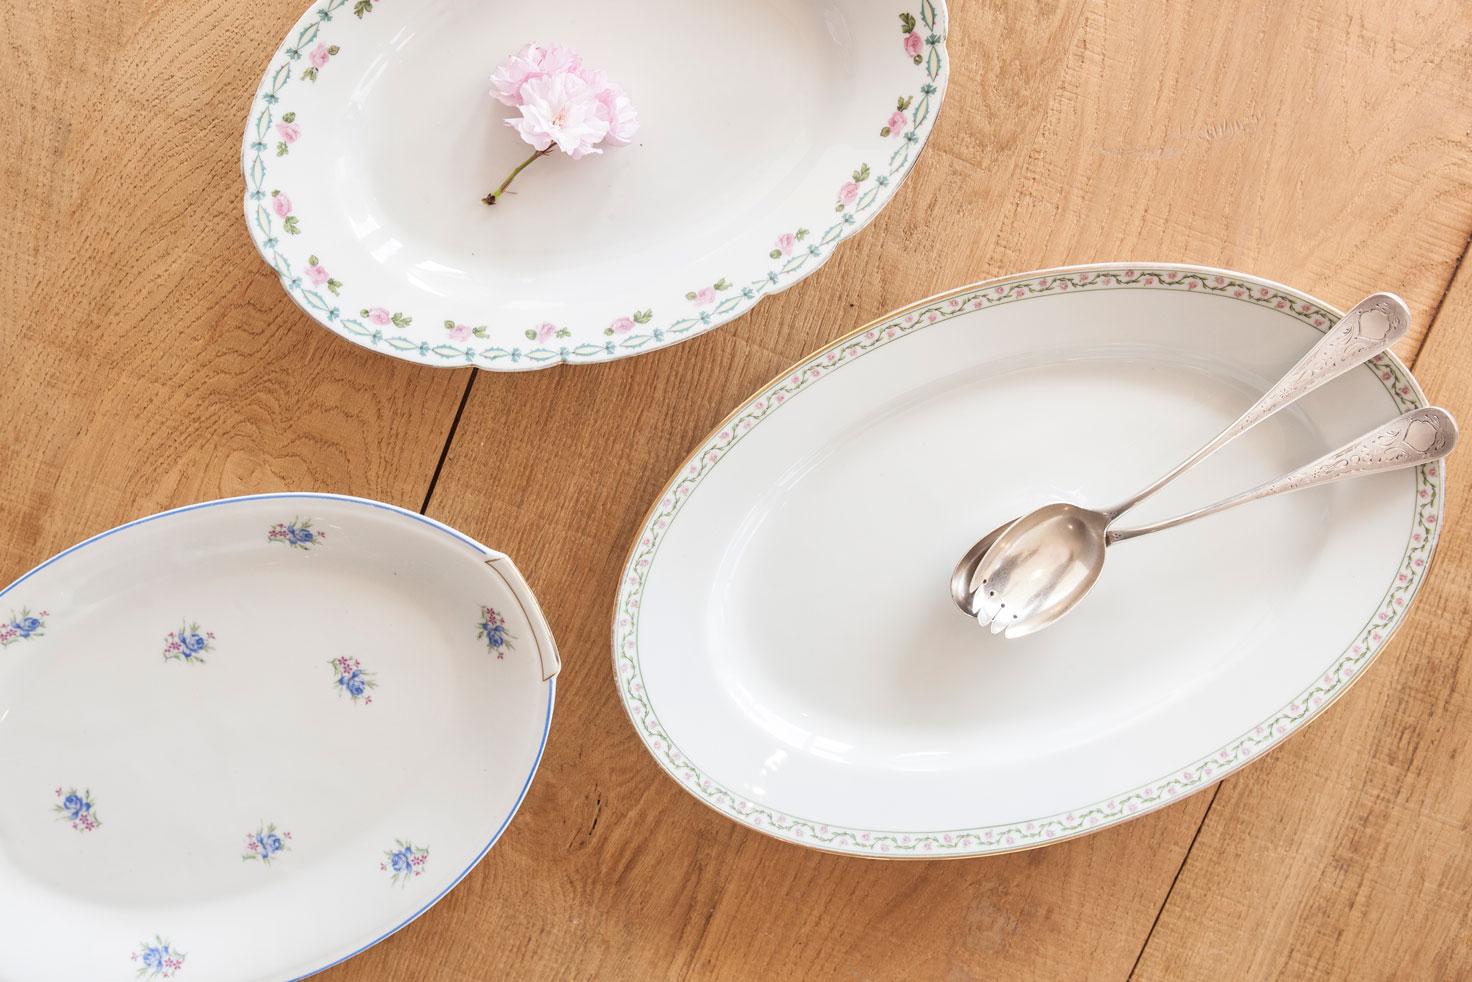 26068-plat-ovale-vintage-fleuri-copie